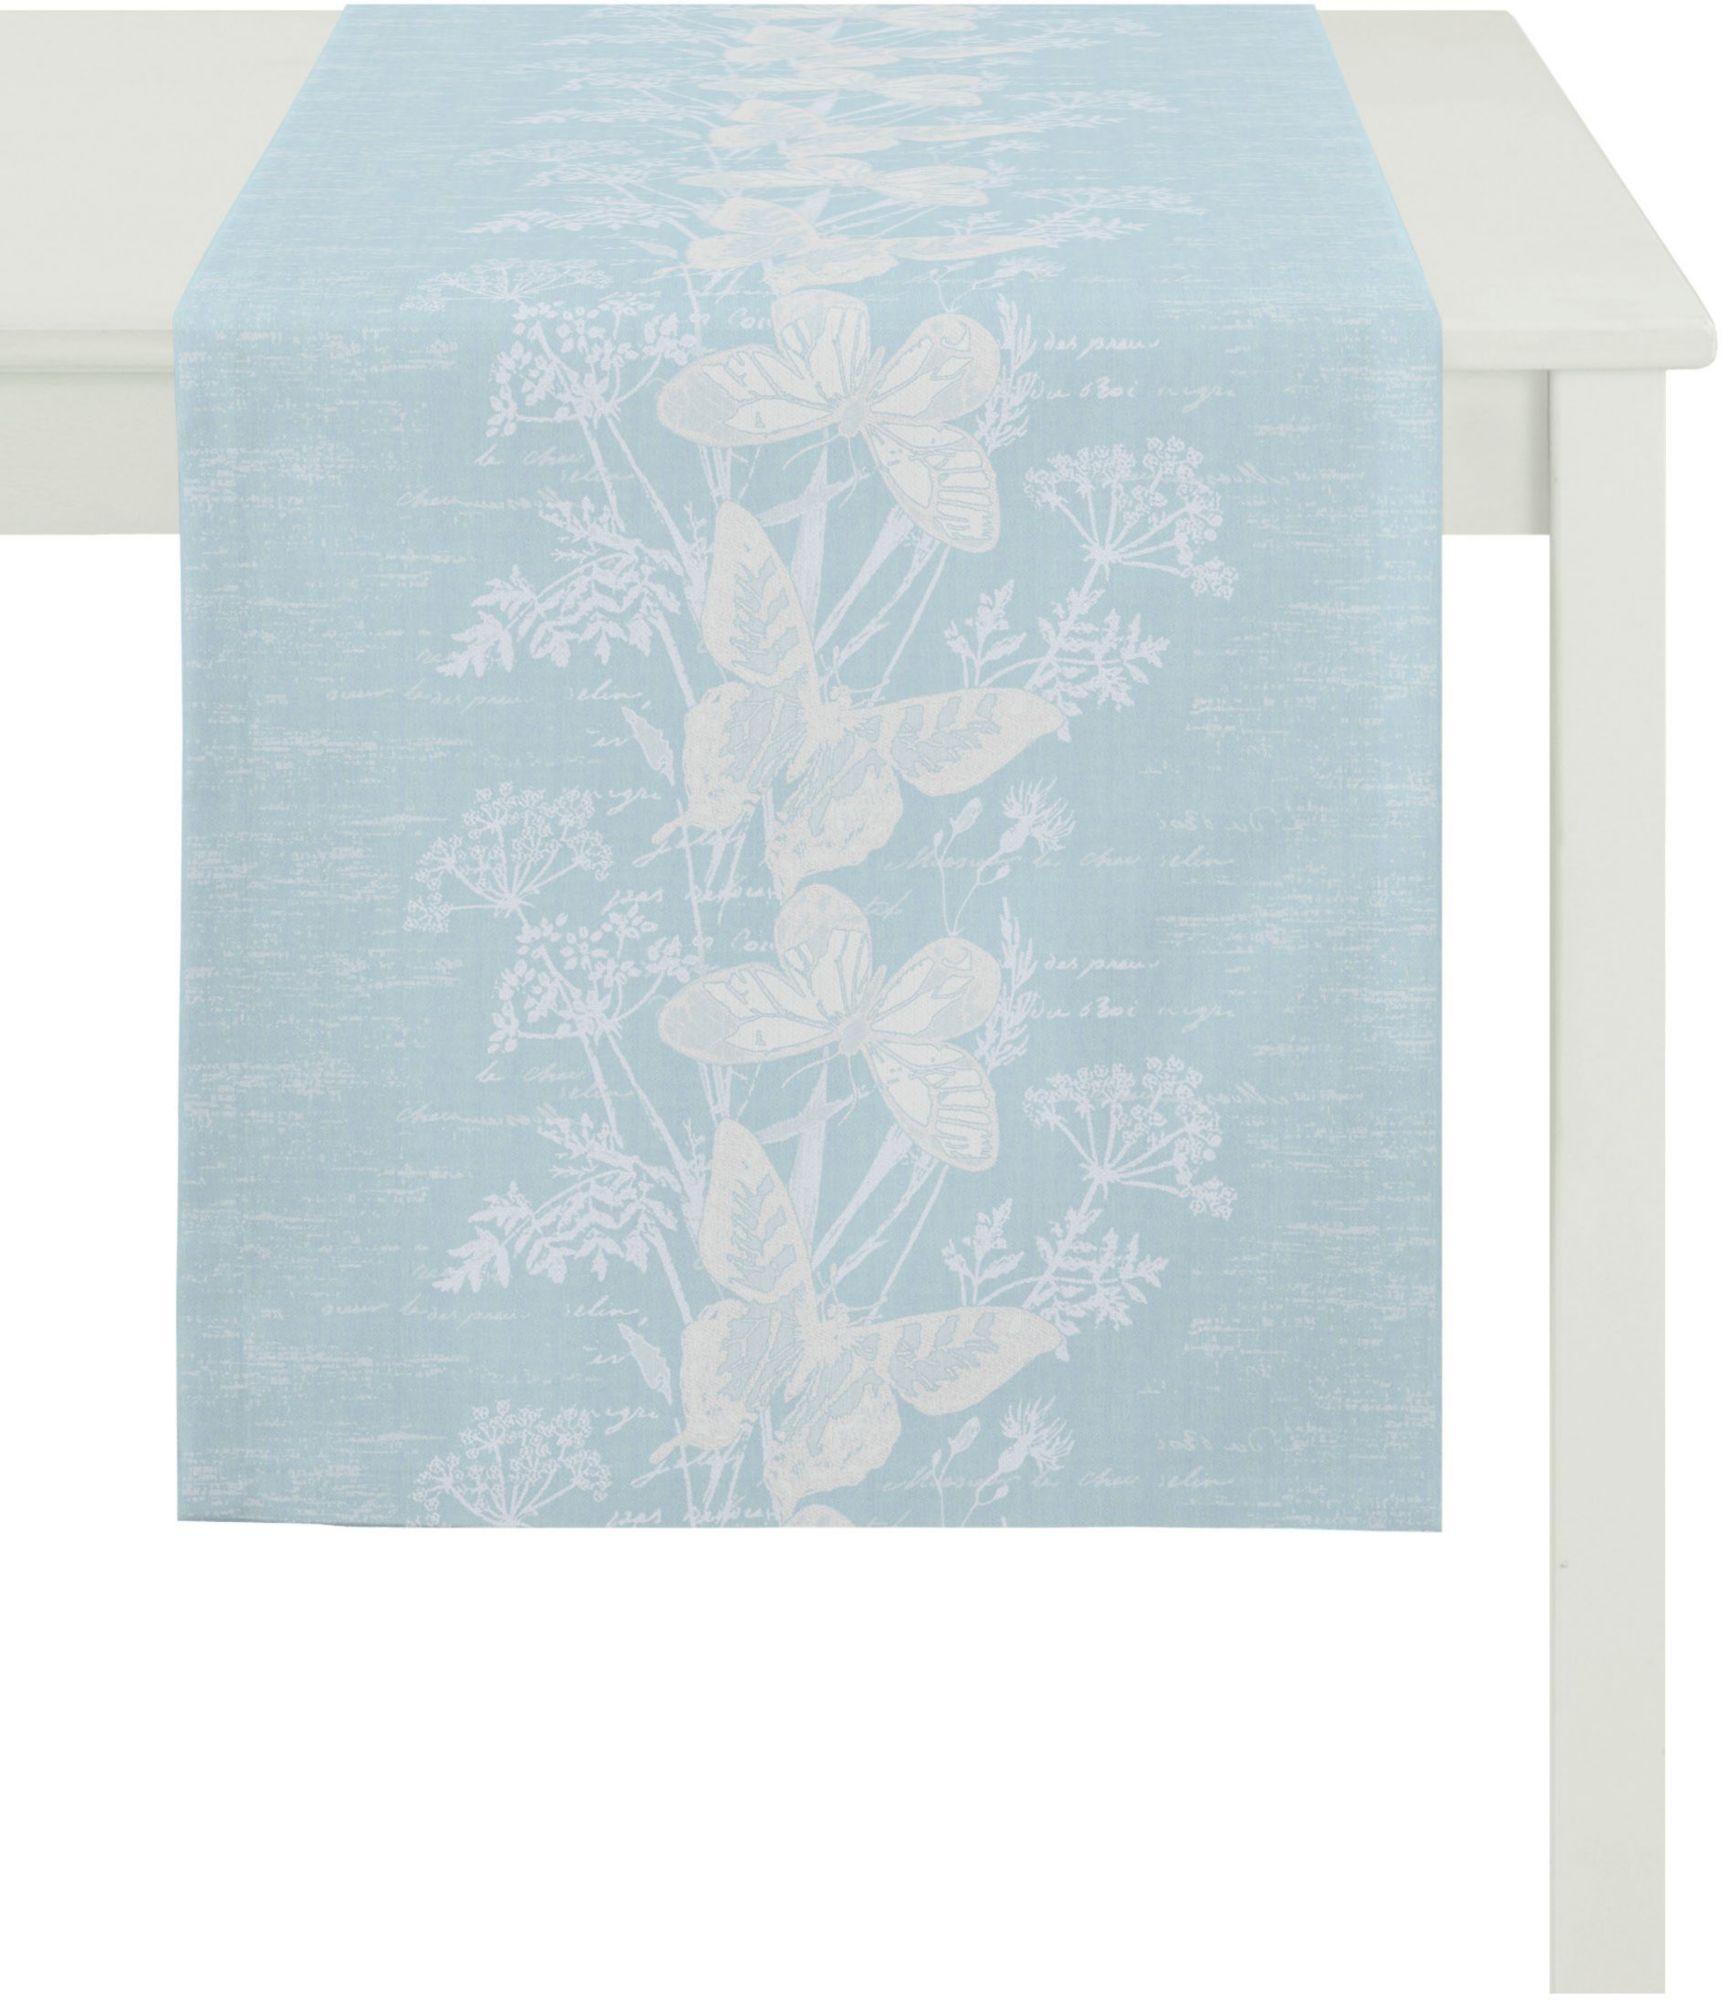 APELT Apelt Tischläufer, 48x140 cm, »2208 SPRINGTIME«